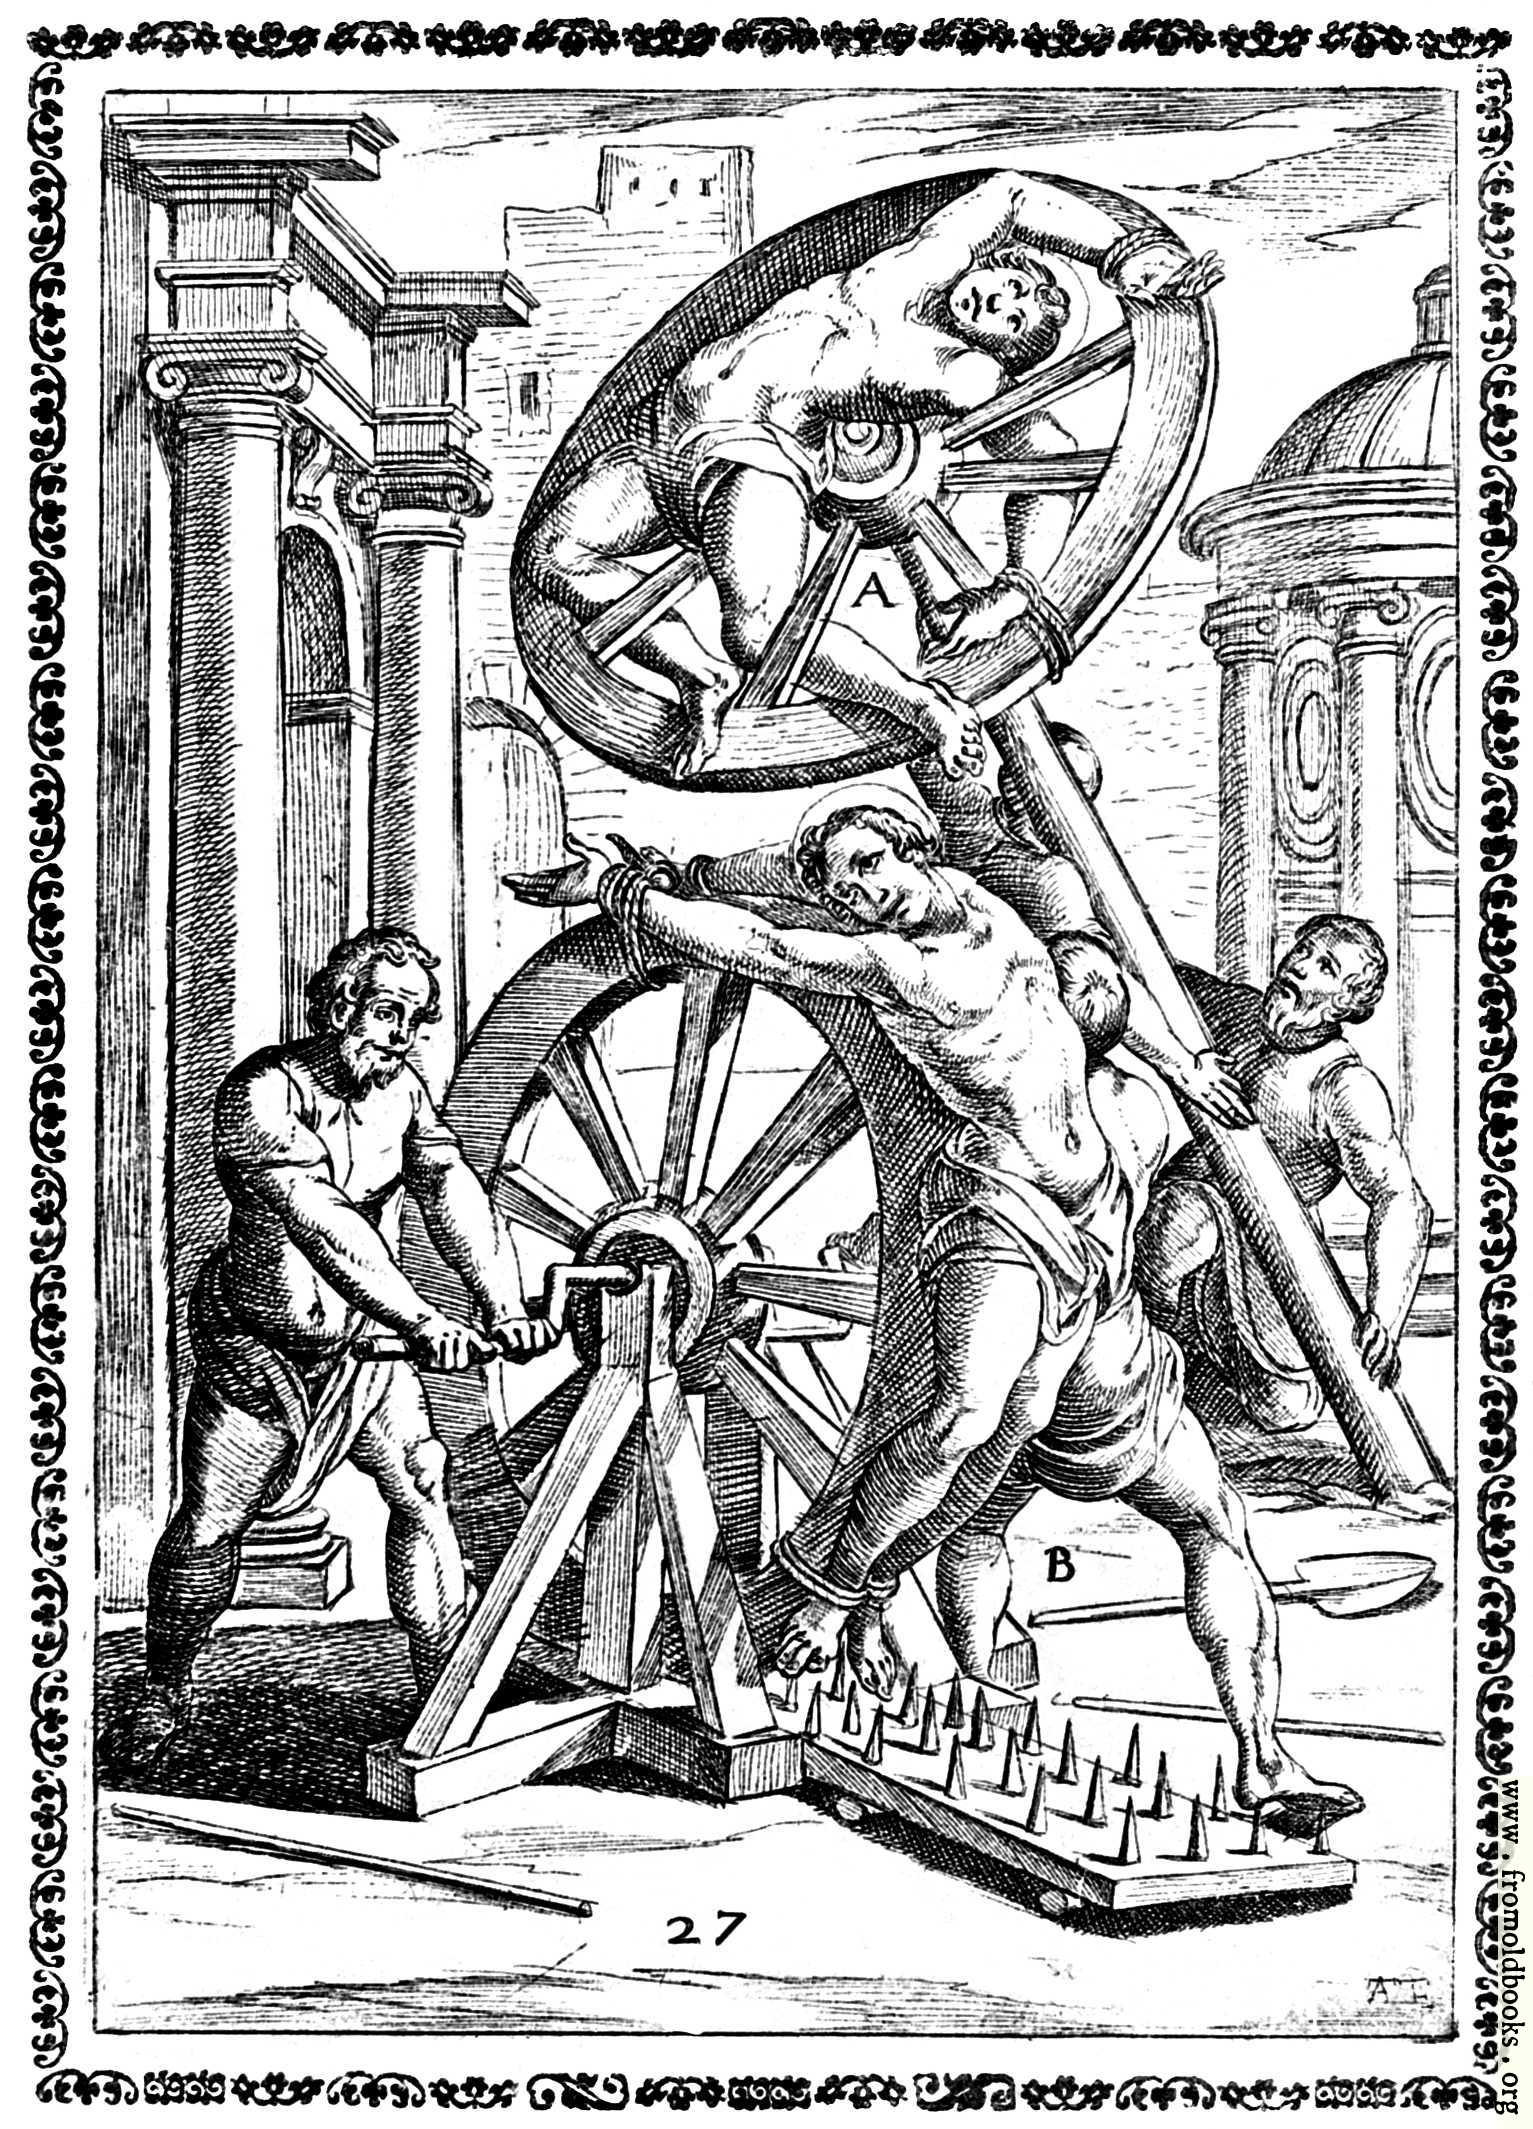 Mittelalter tortur nackt photos